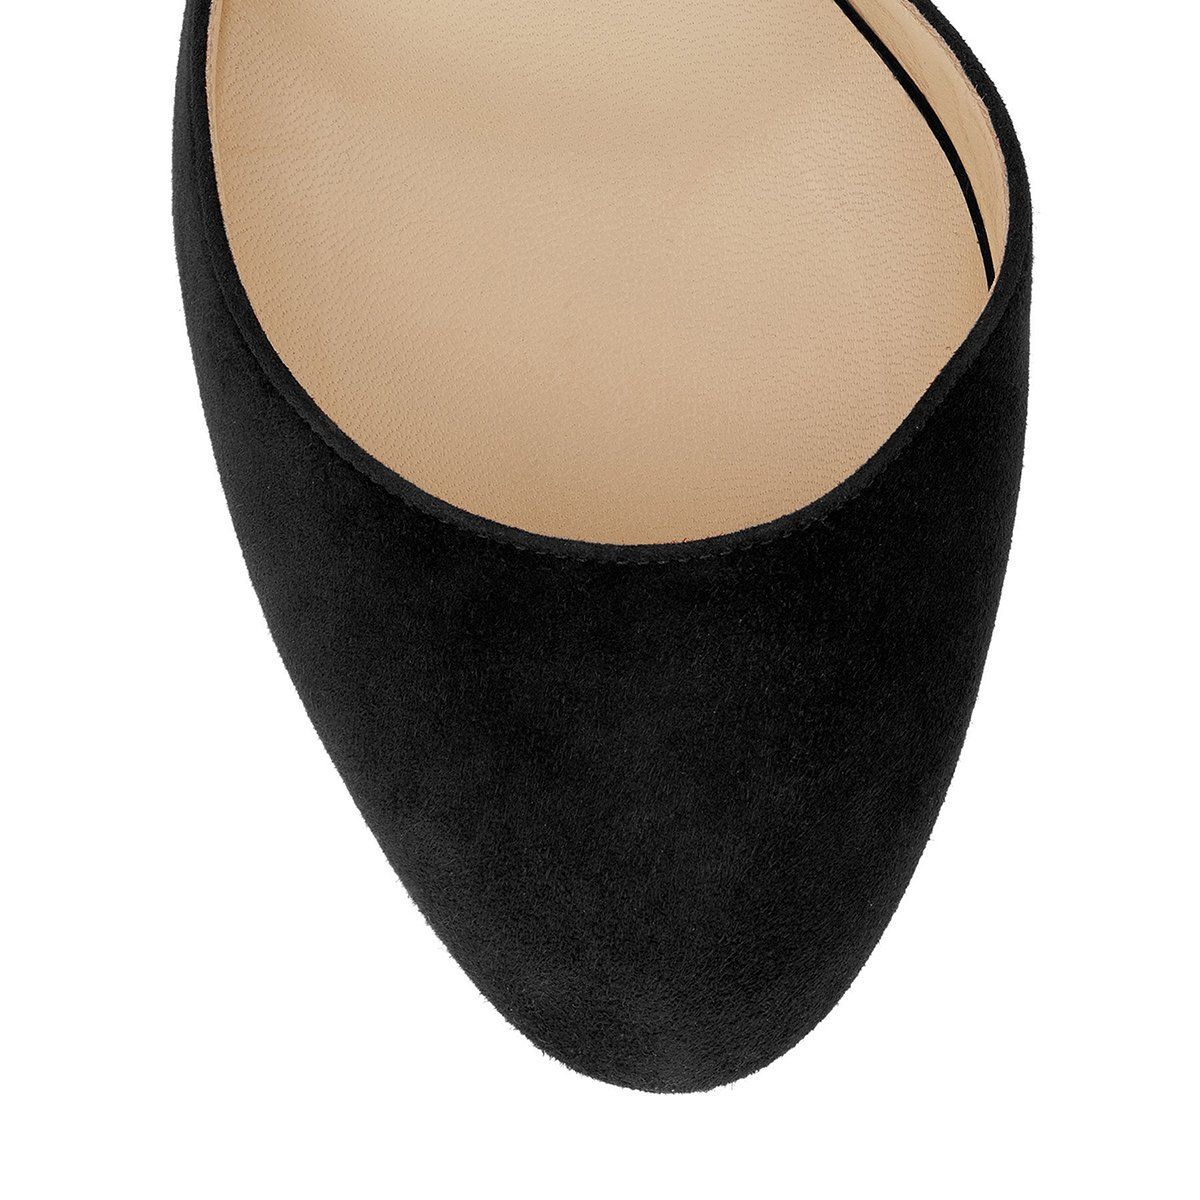 NJ Women Round Toe High Heel DOrsay Pumps Transparent Ankle Strap Sandals Dress Buckle Shoes